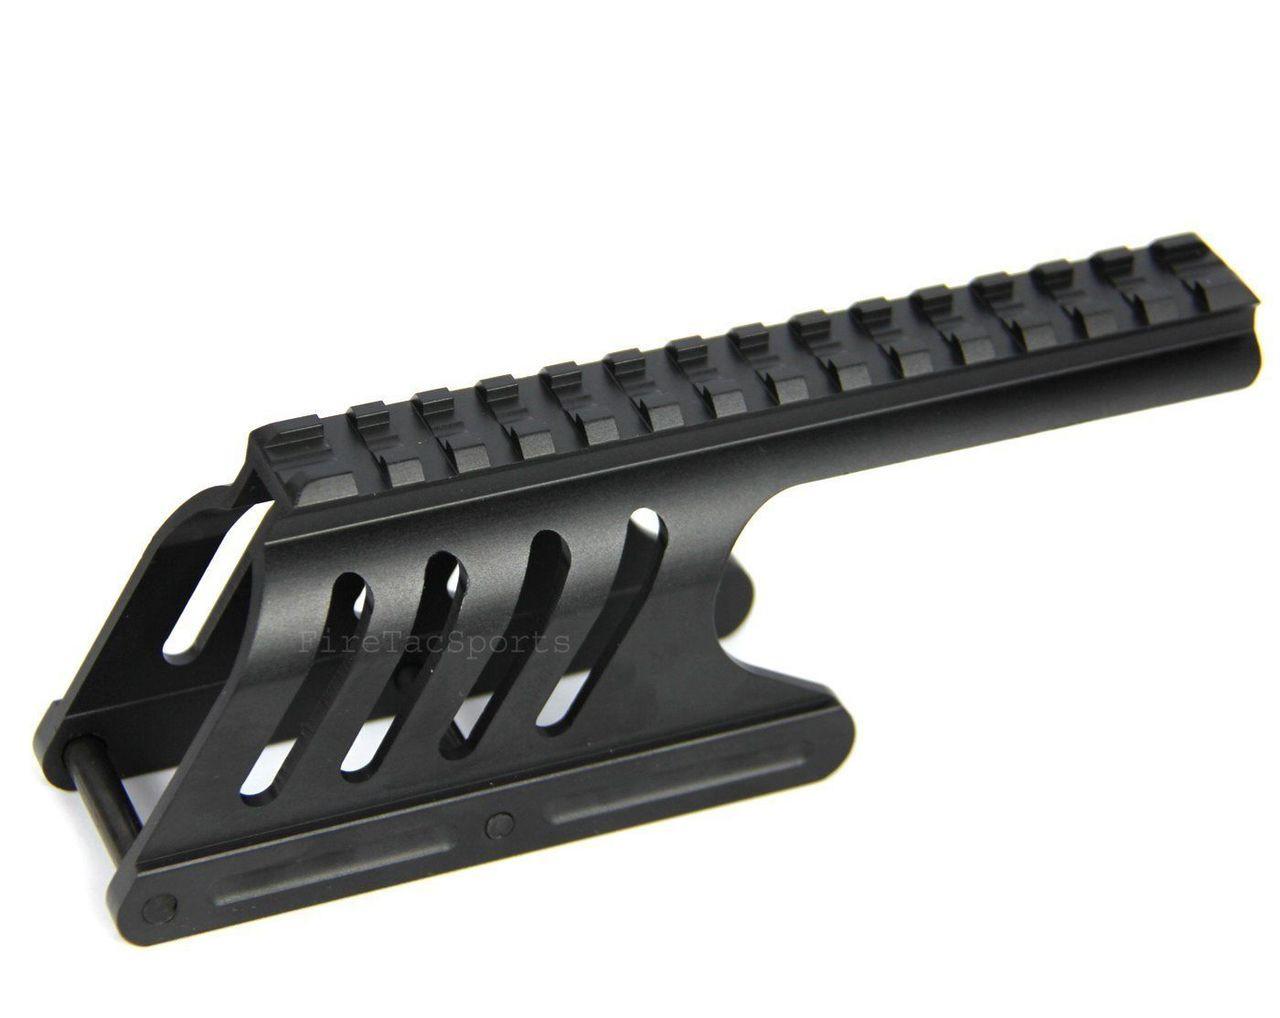 Remington 870 12 GA Saddle Tactical Scope Sight Rail shotgun Mount